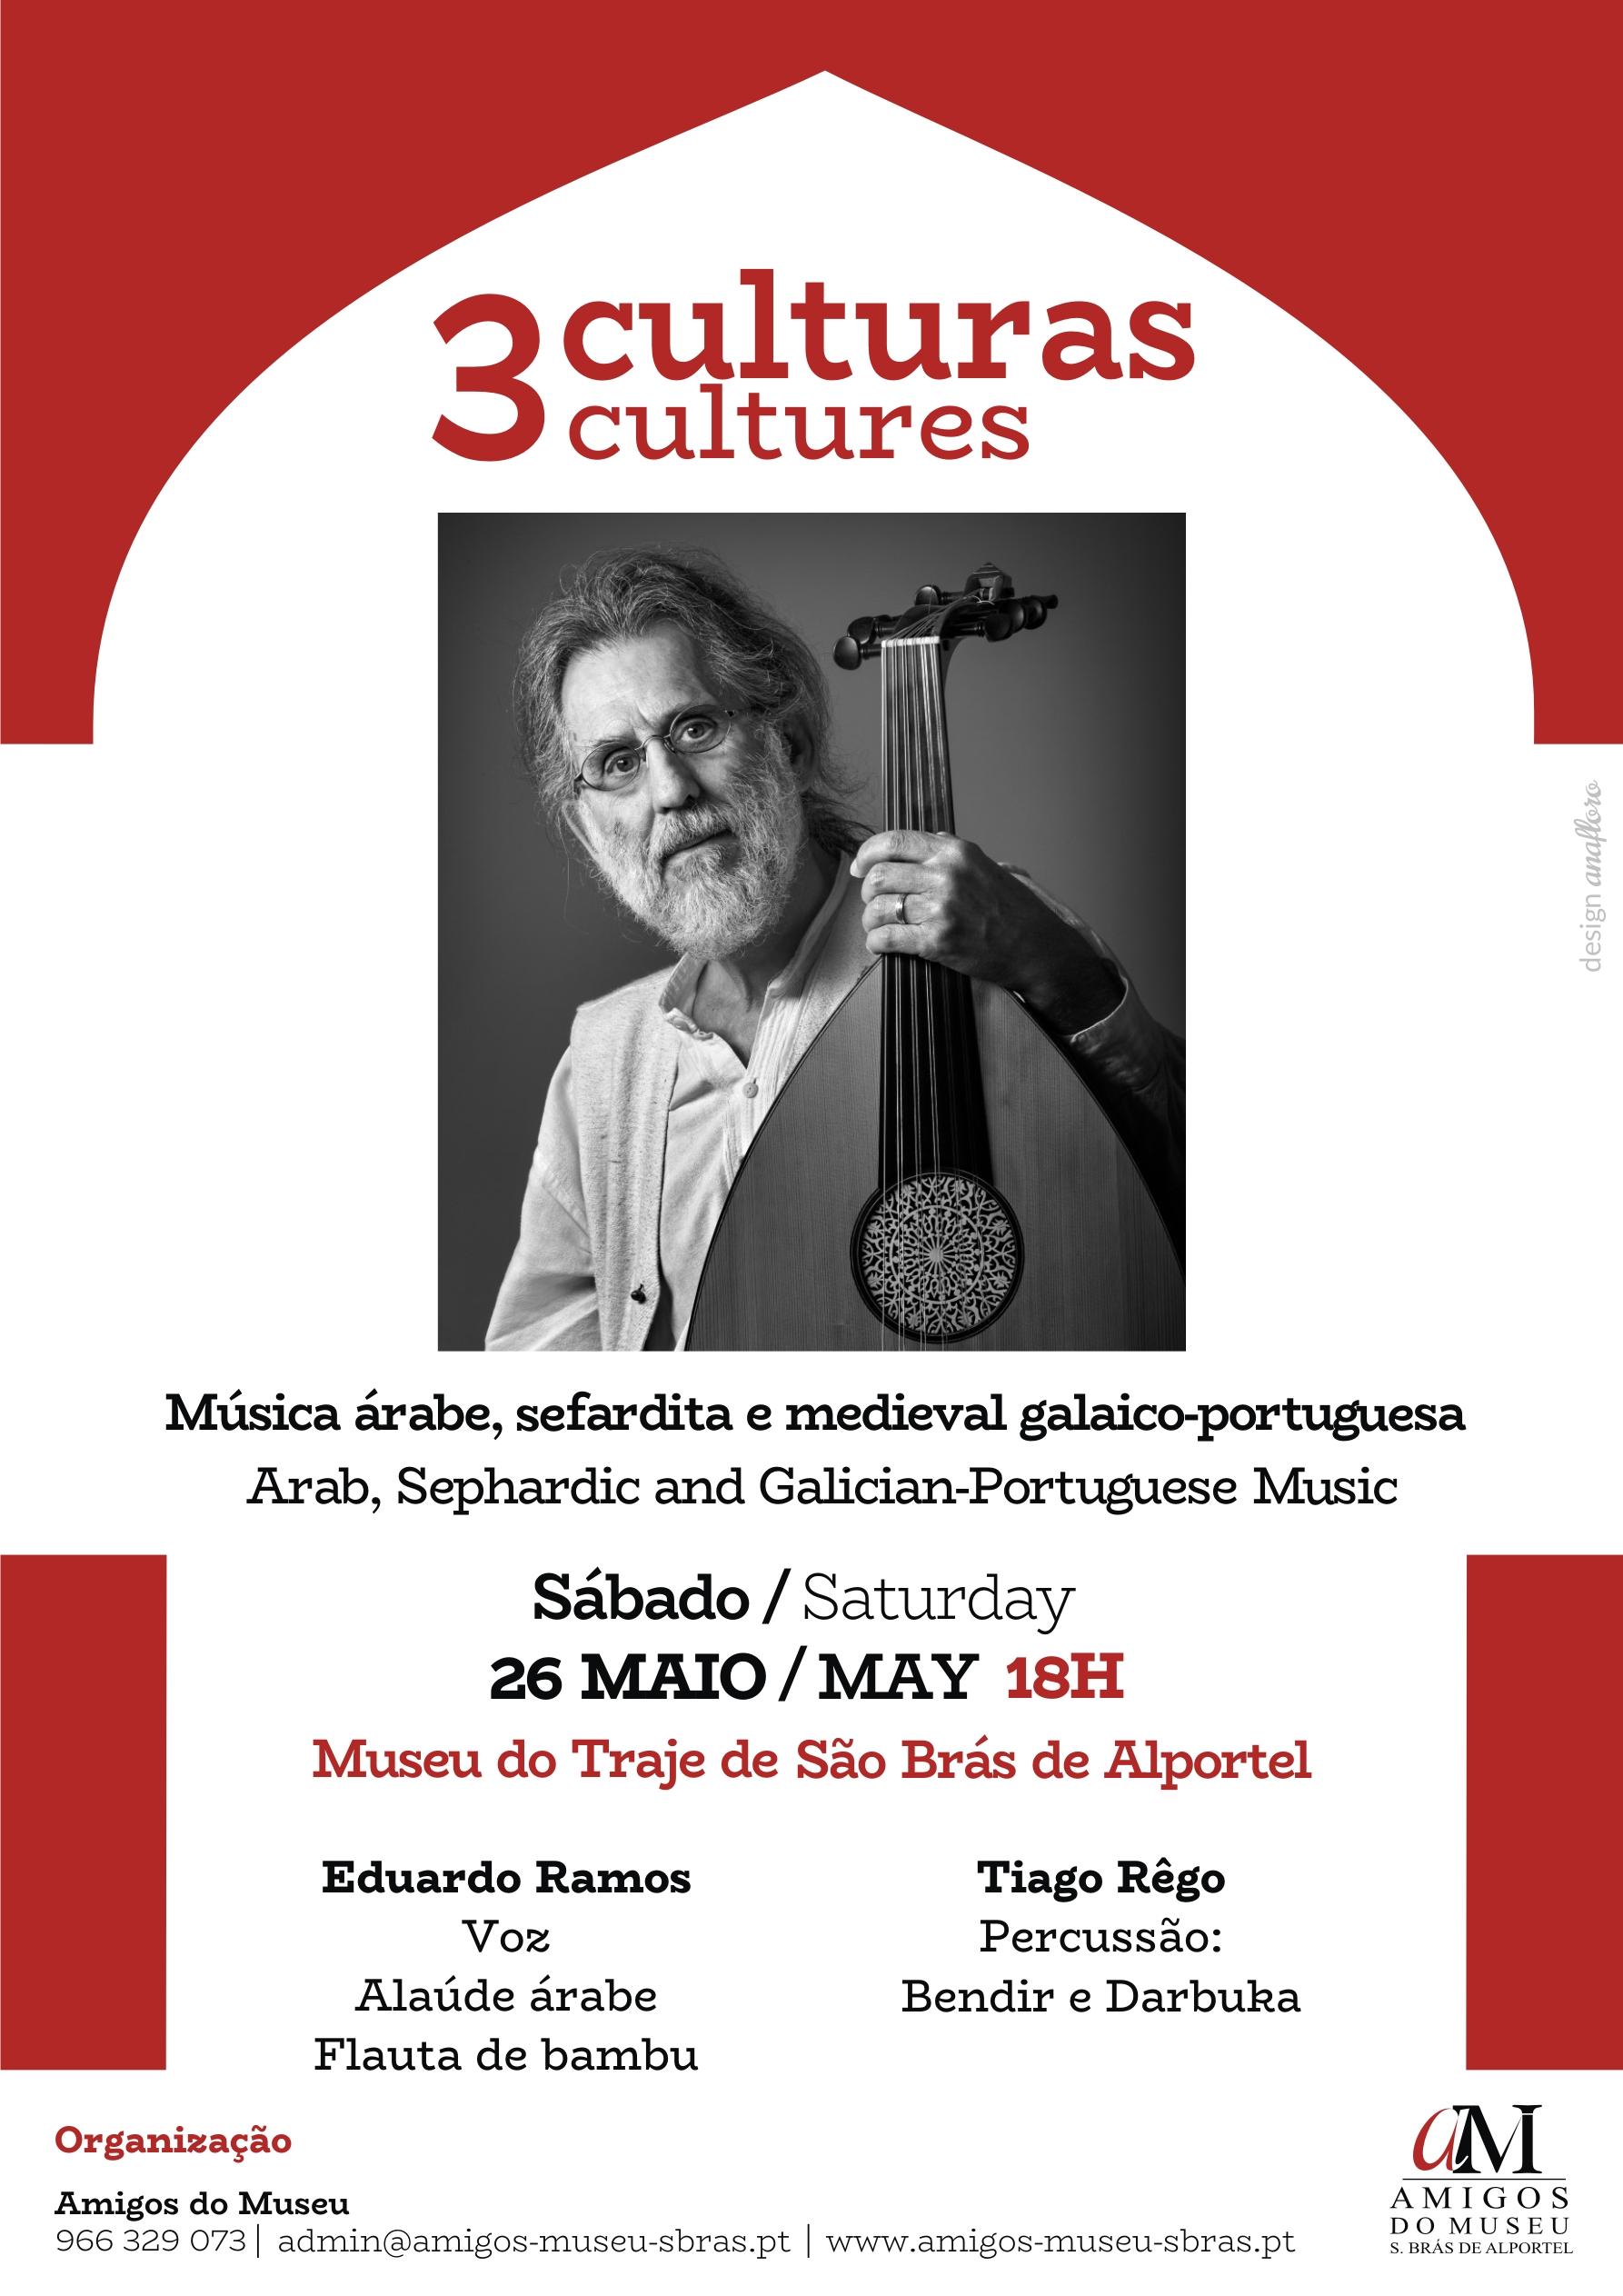 cartaz do concerto 3 culturas